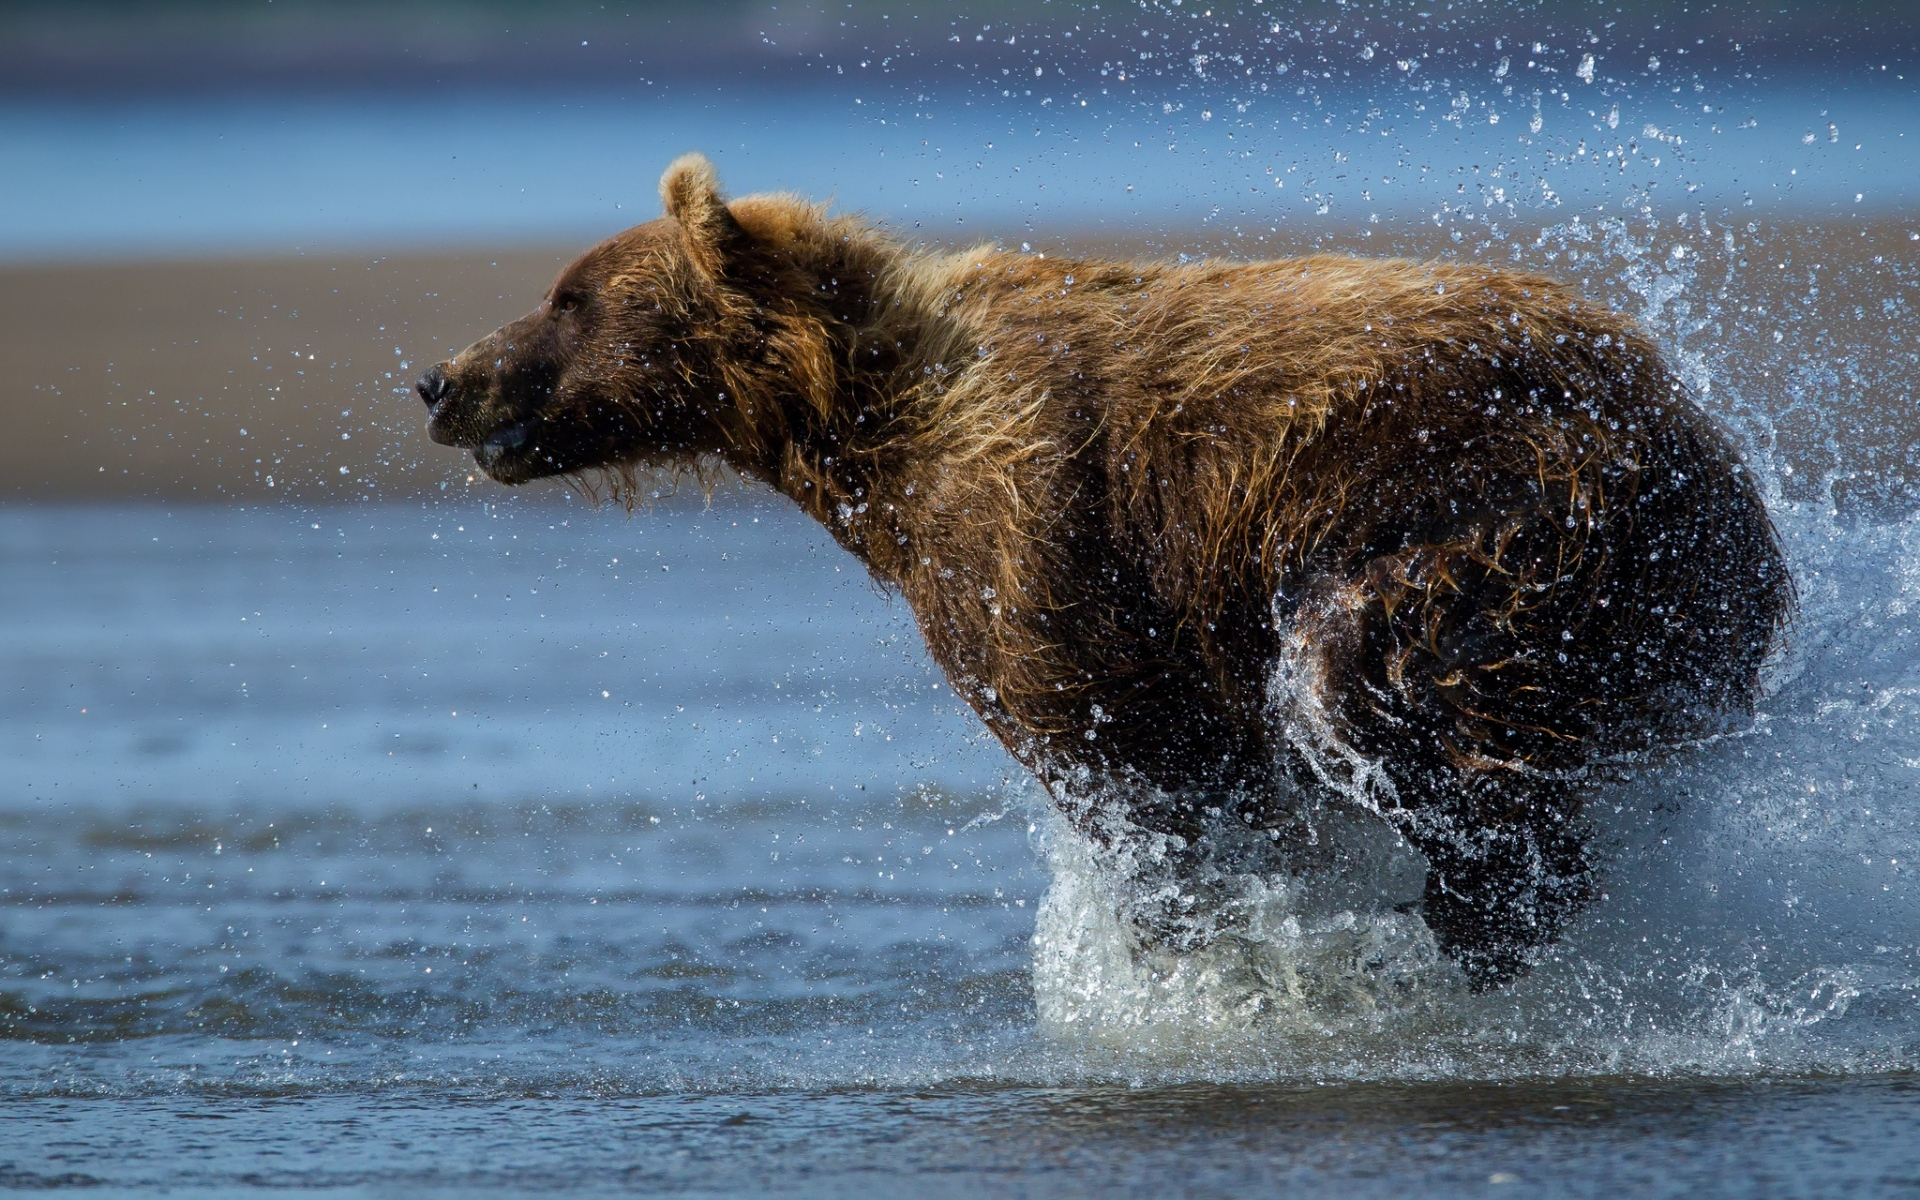 того, картинки мокрый медведь крэйг